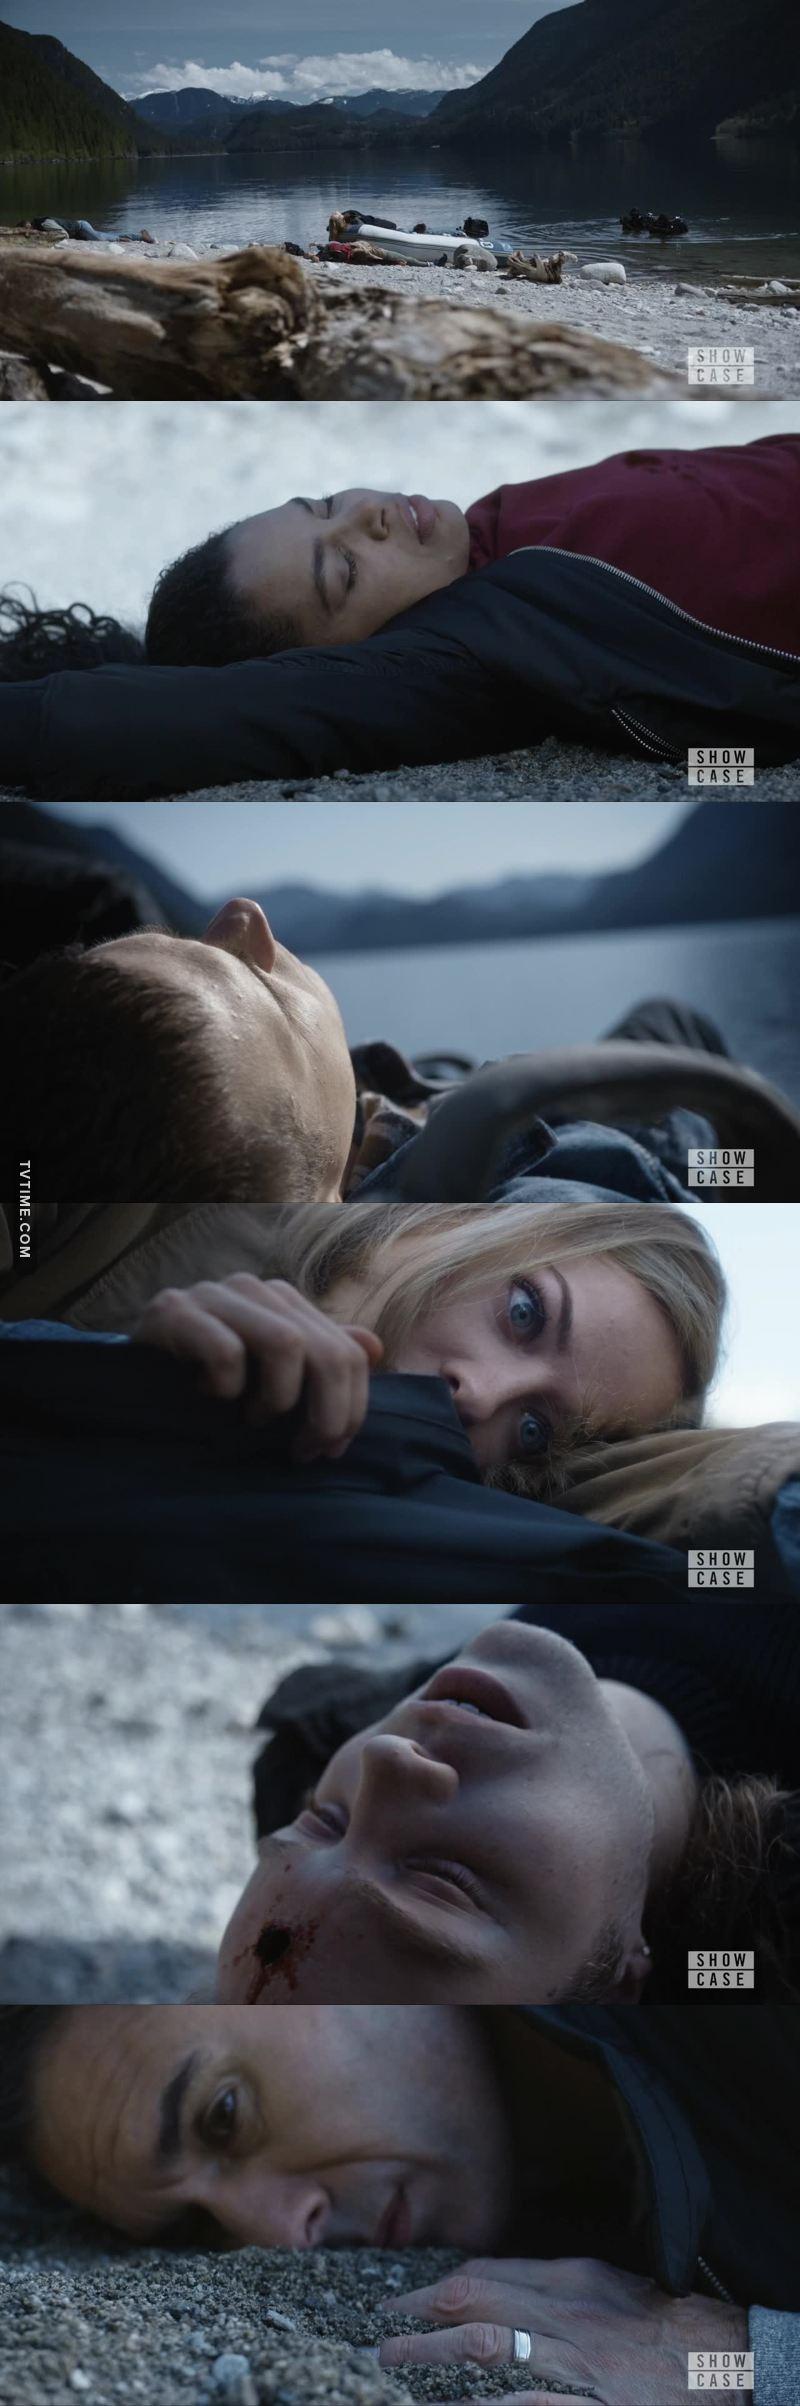 This episode makes me so anxious...